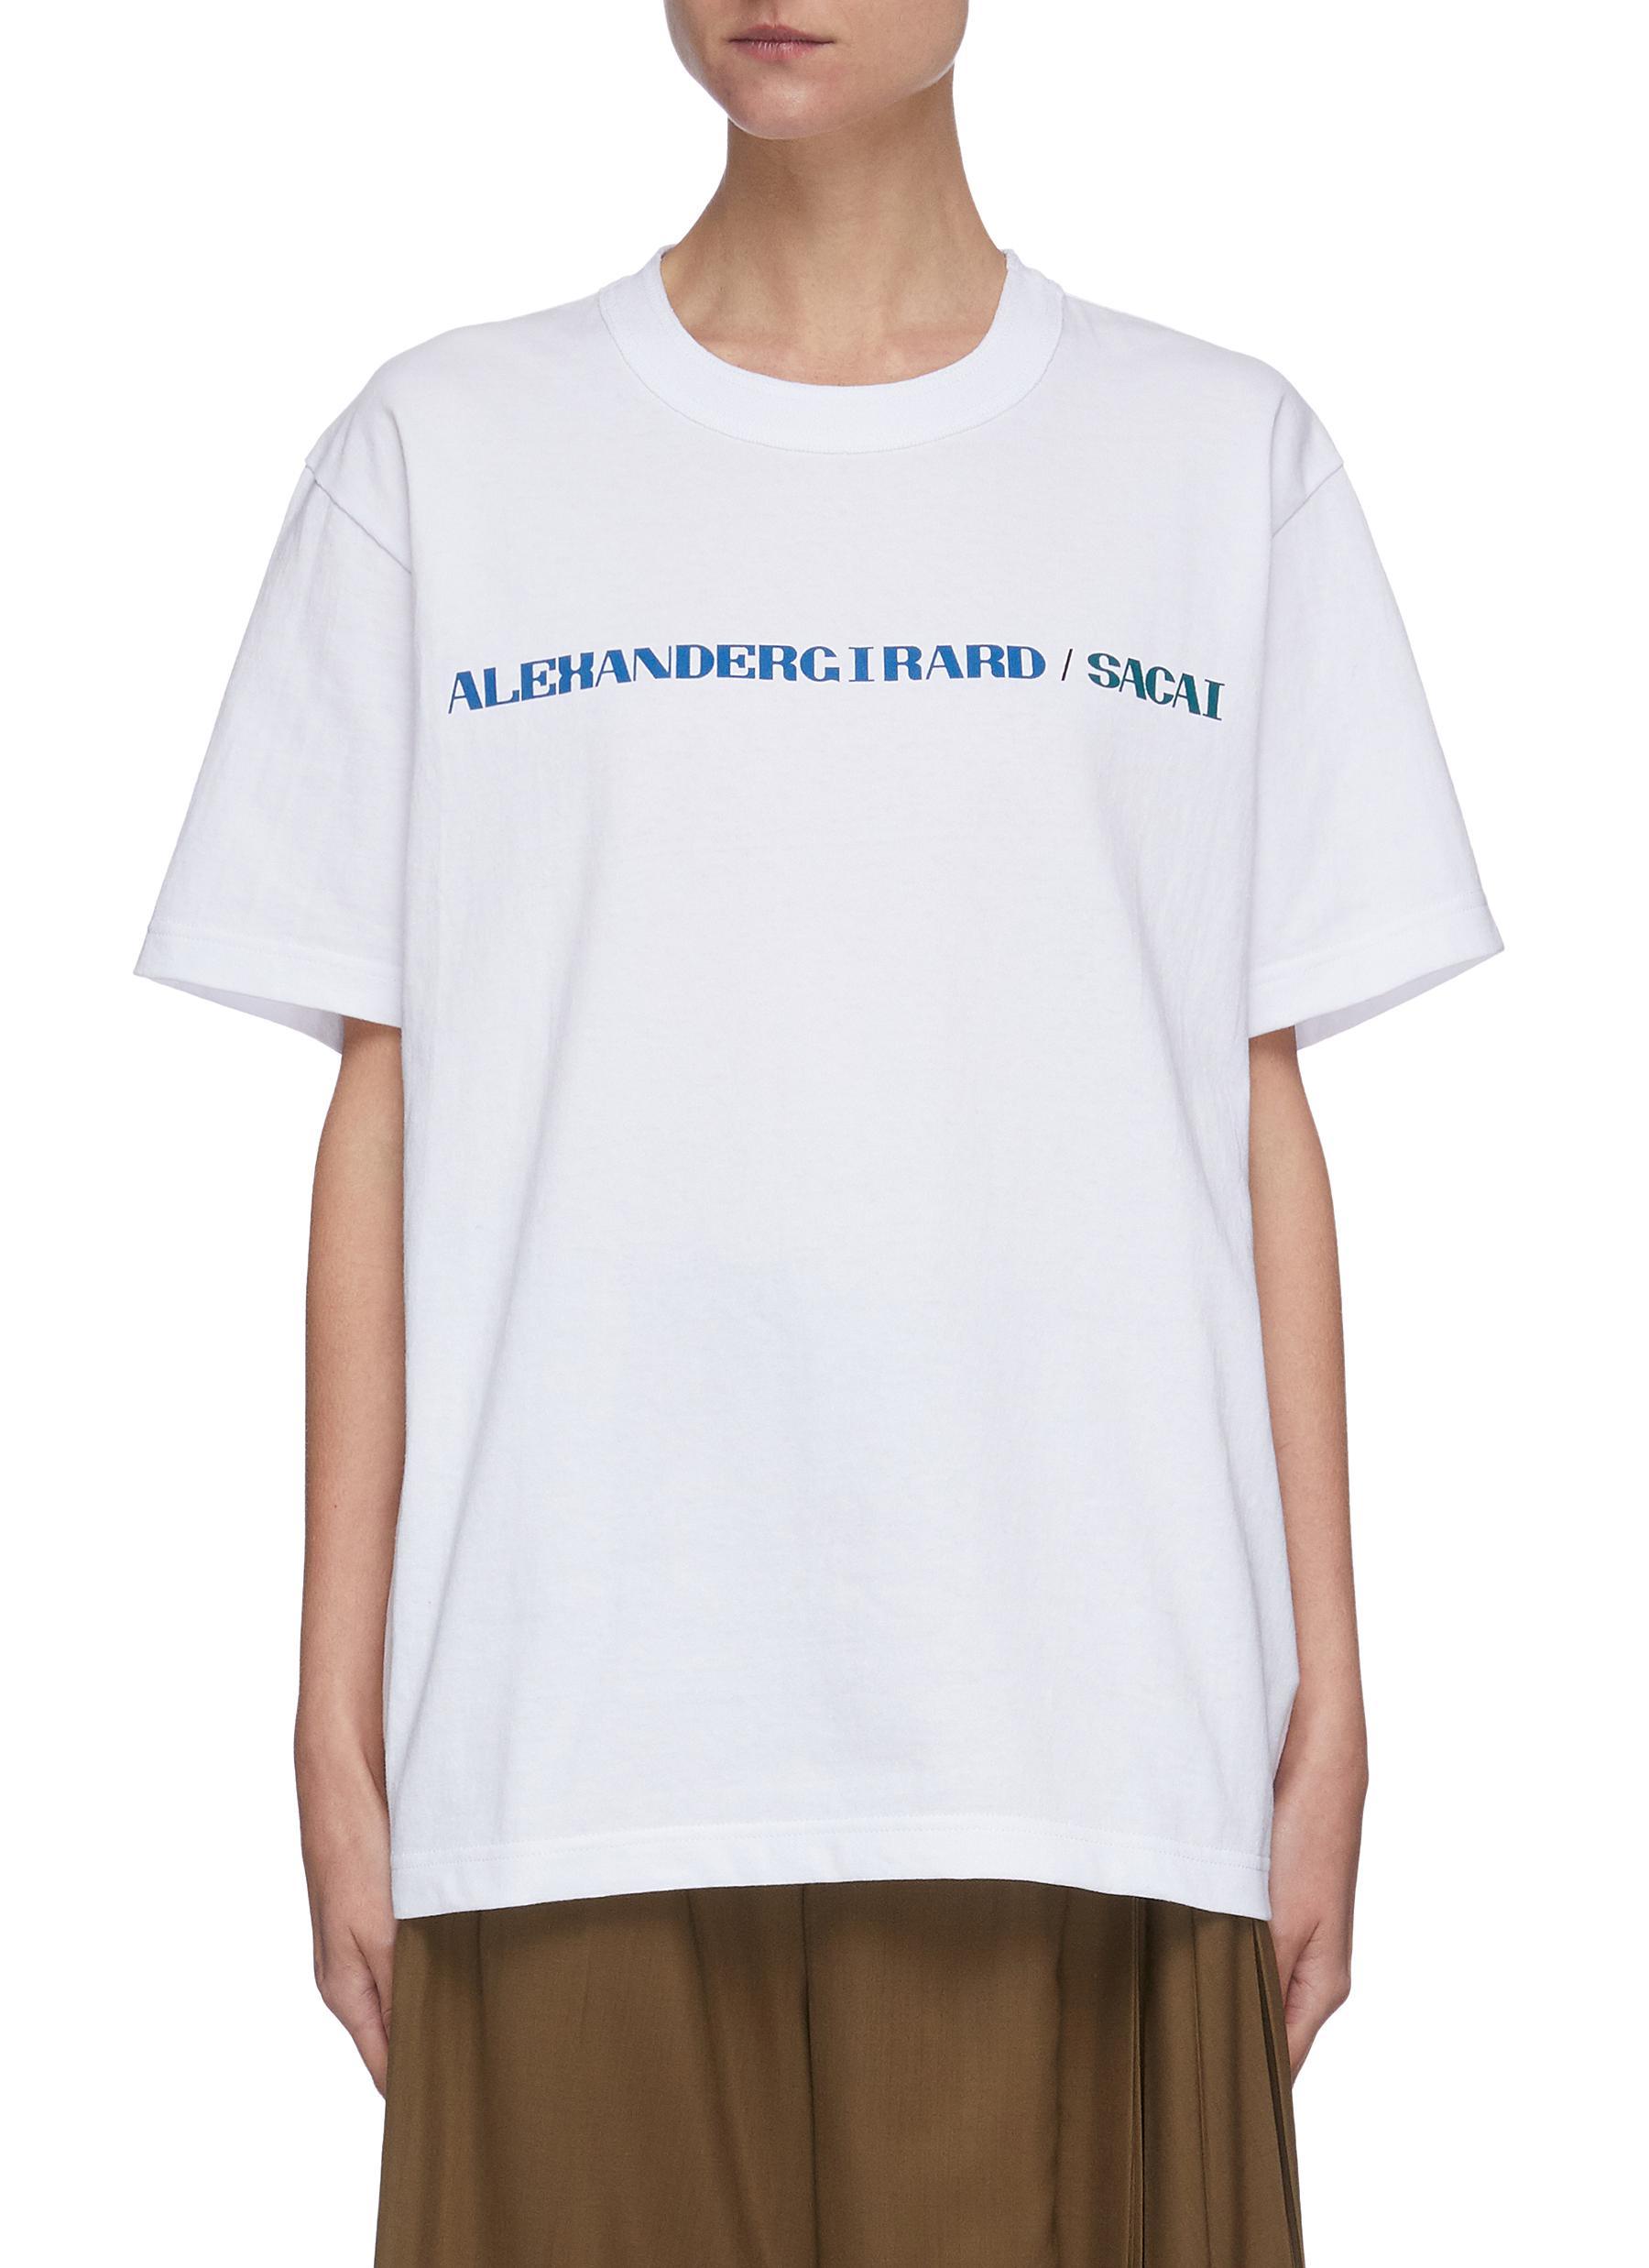 Sacai X ALEXANDER GIRARD LOGO PRINT T-SHIRT